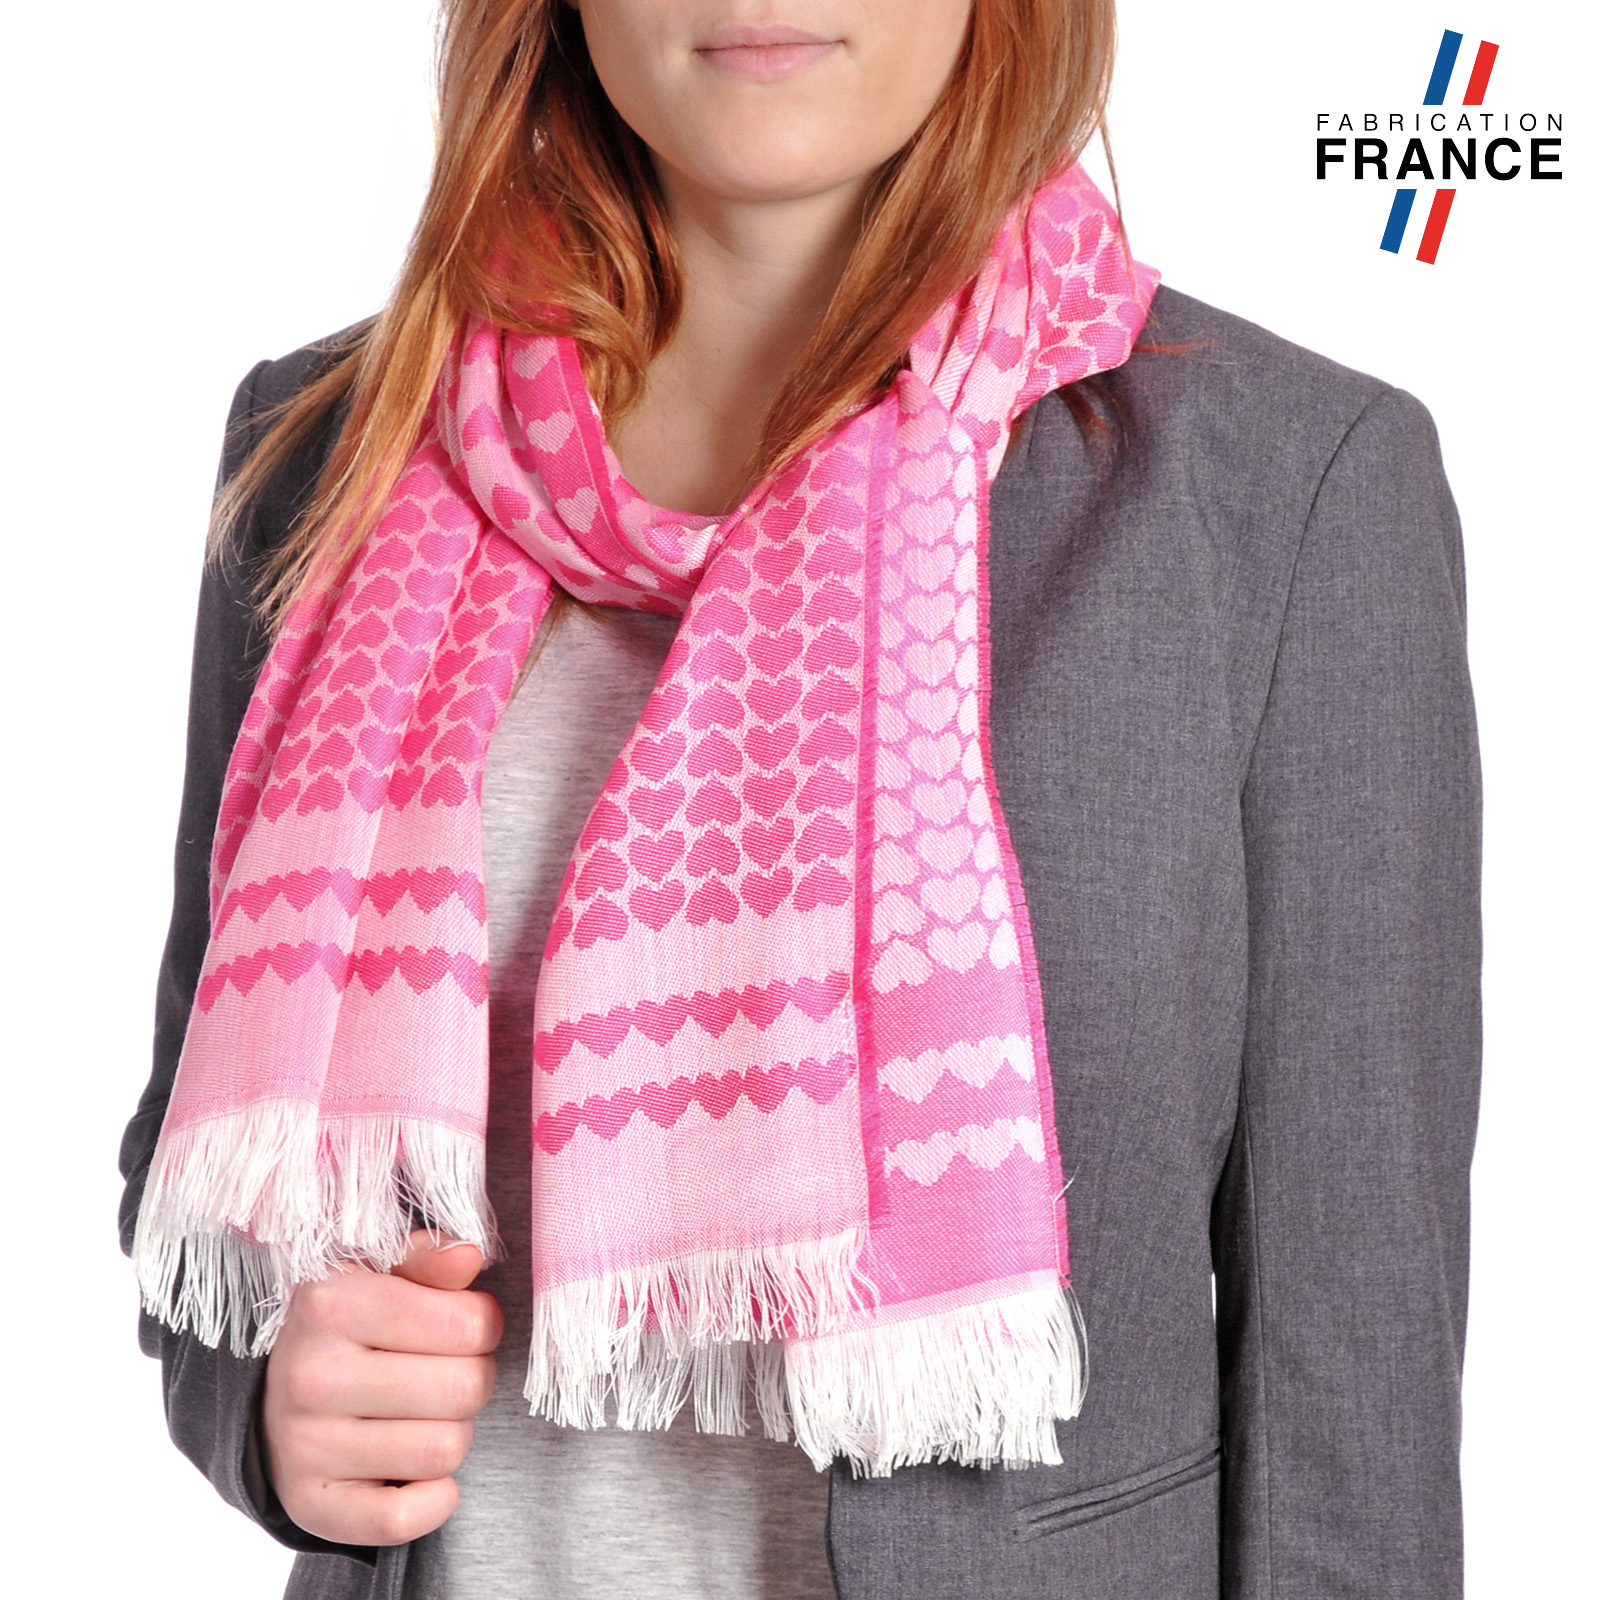 AT-04276-VF16-T-LB_FR-echarpe-femme-fuchsia-coeurs